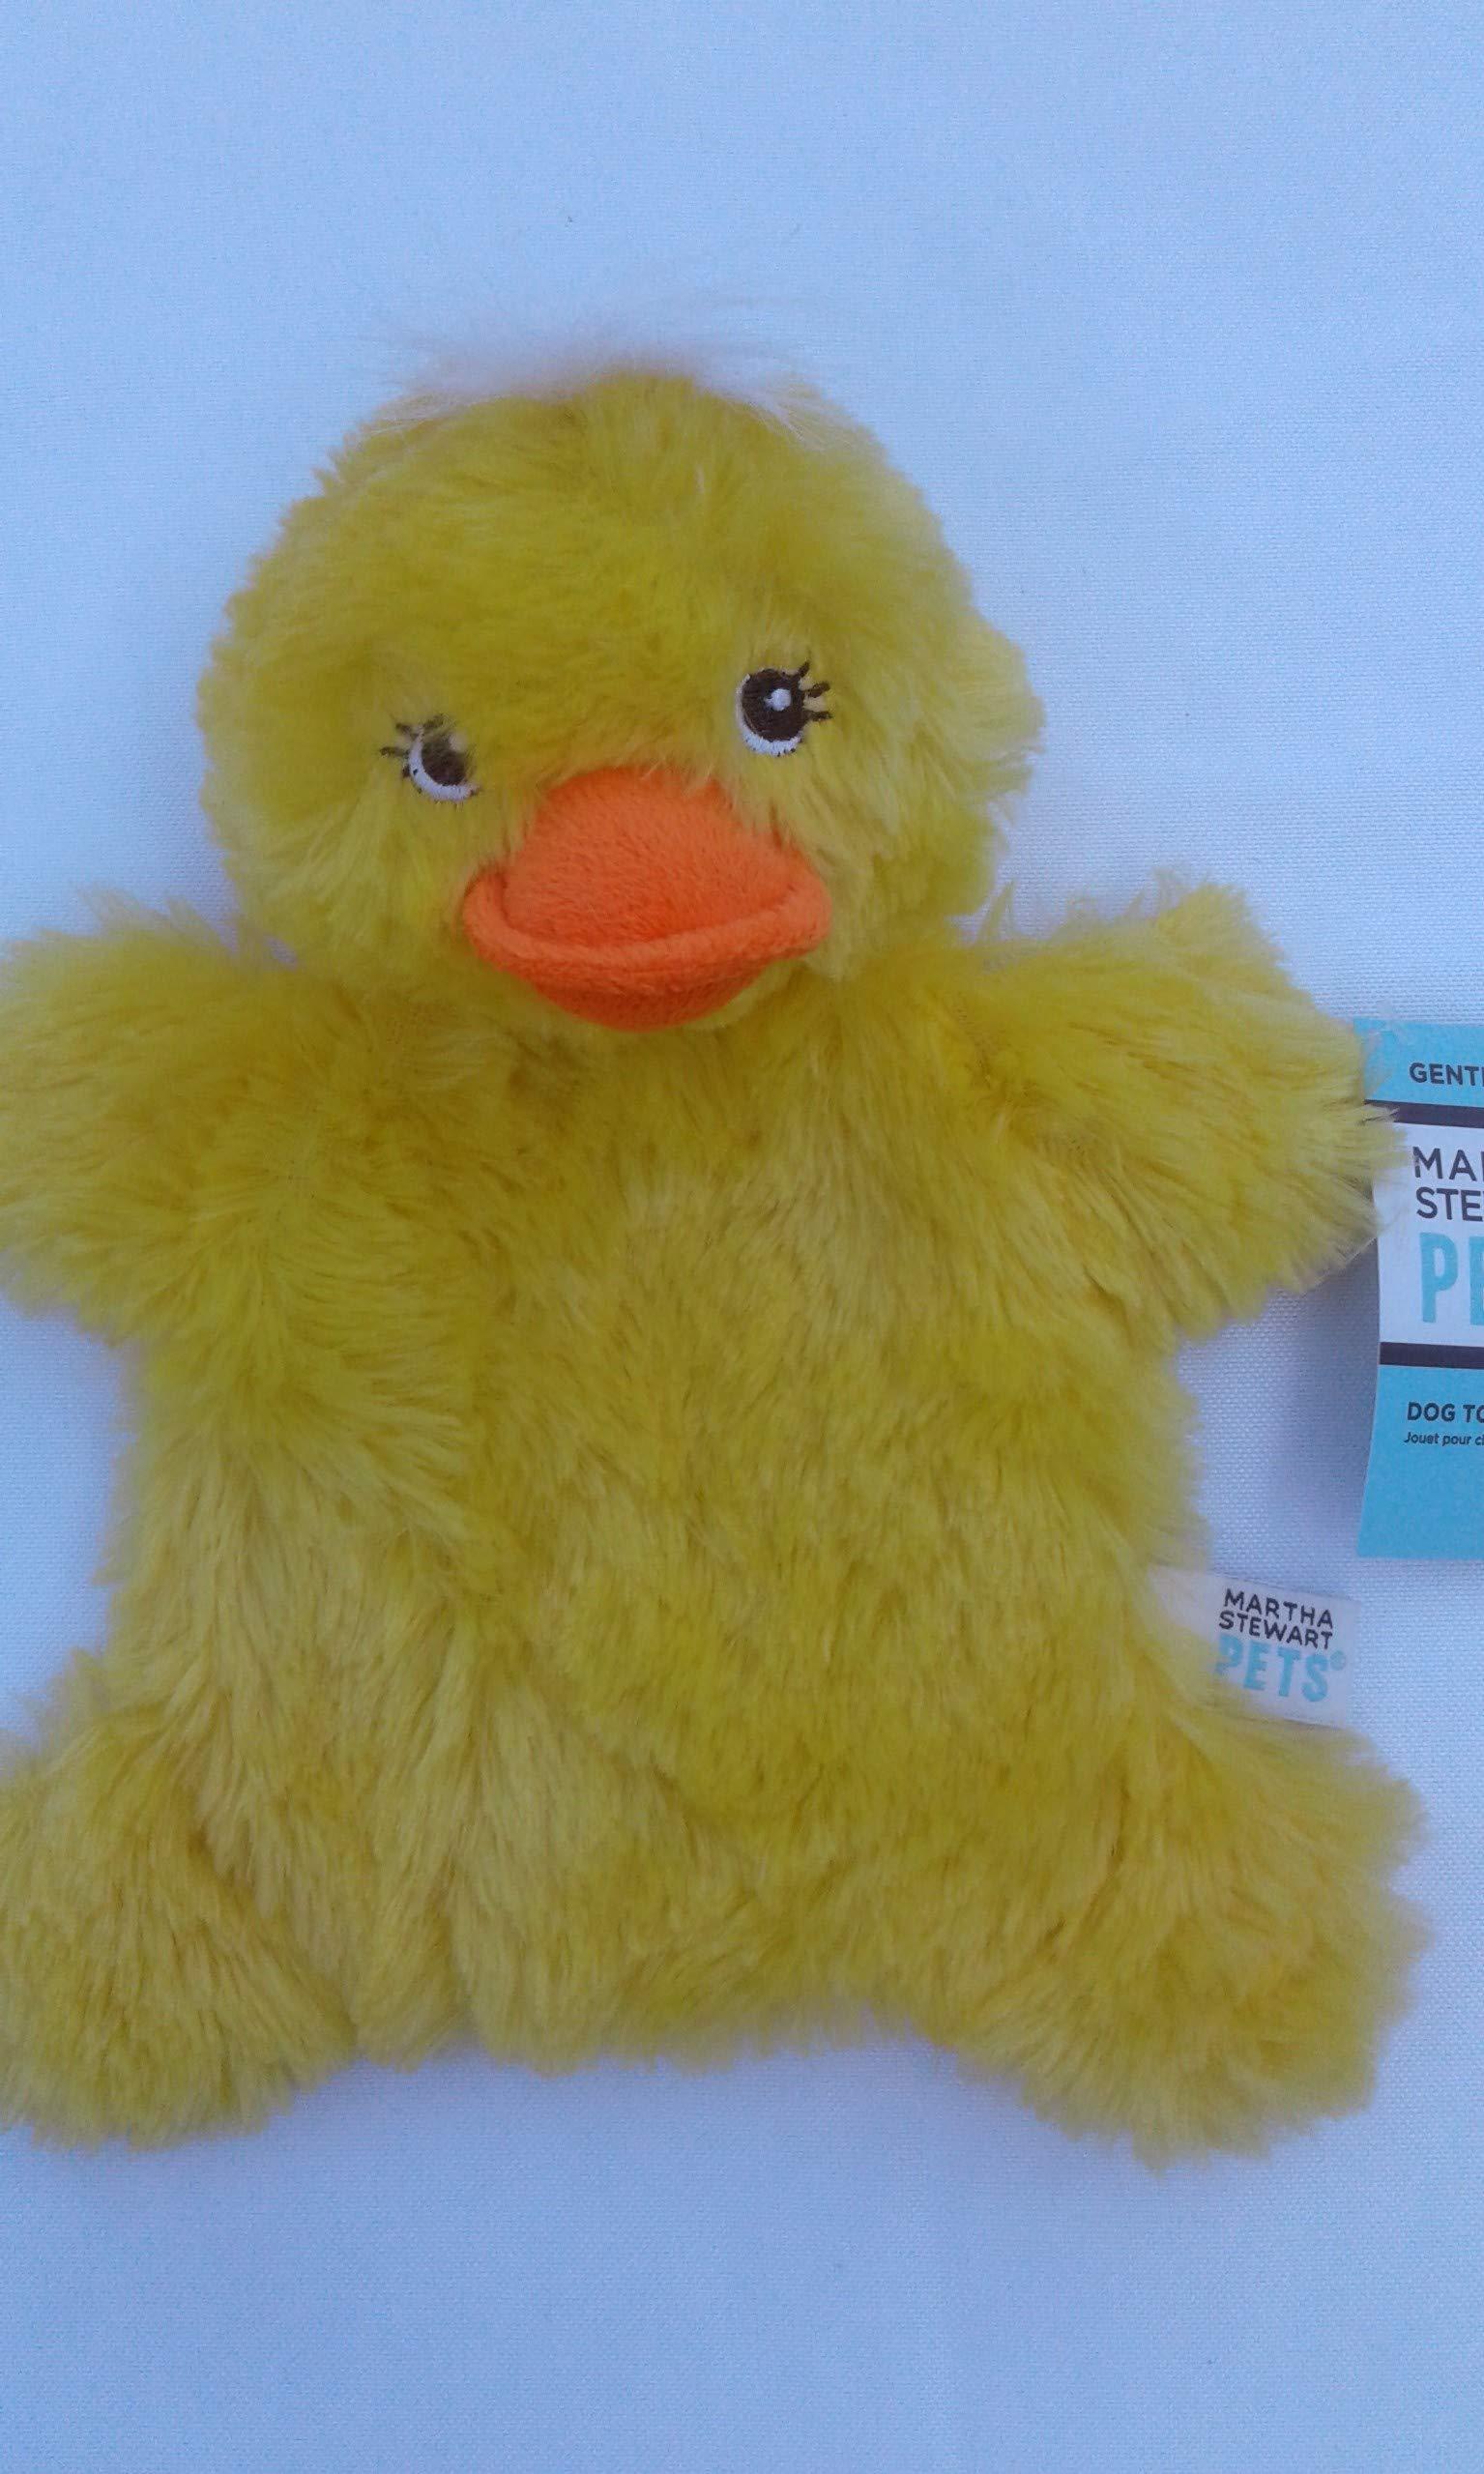 Martha Stewart Pets Plush Yellow Duck Crinkle & Squeaker Dog Toy